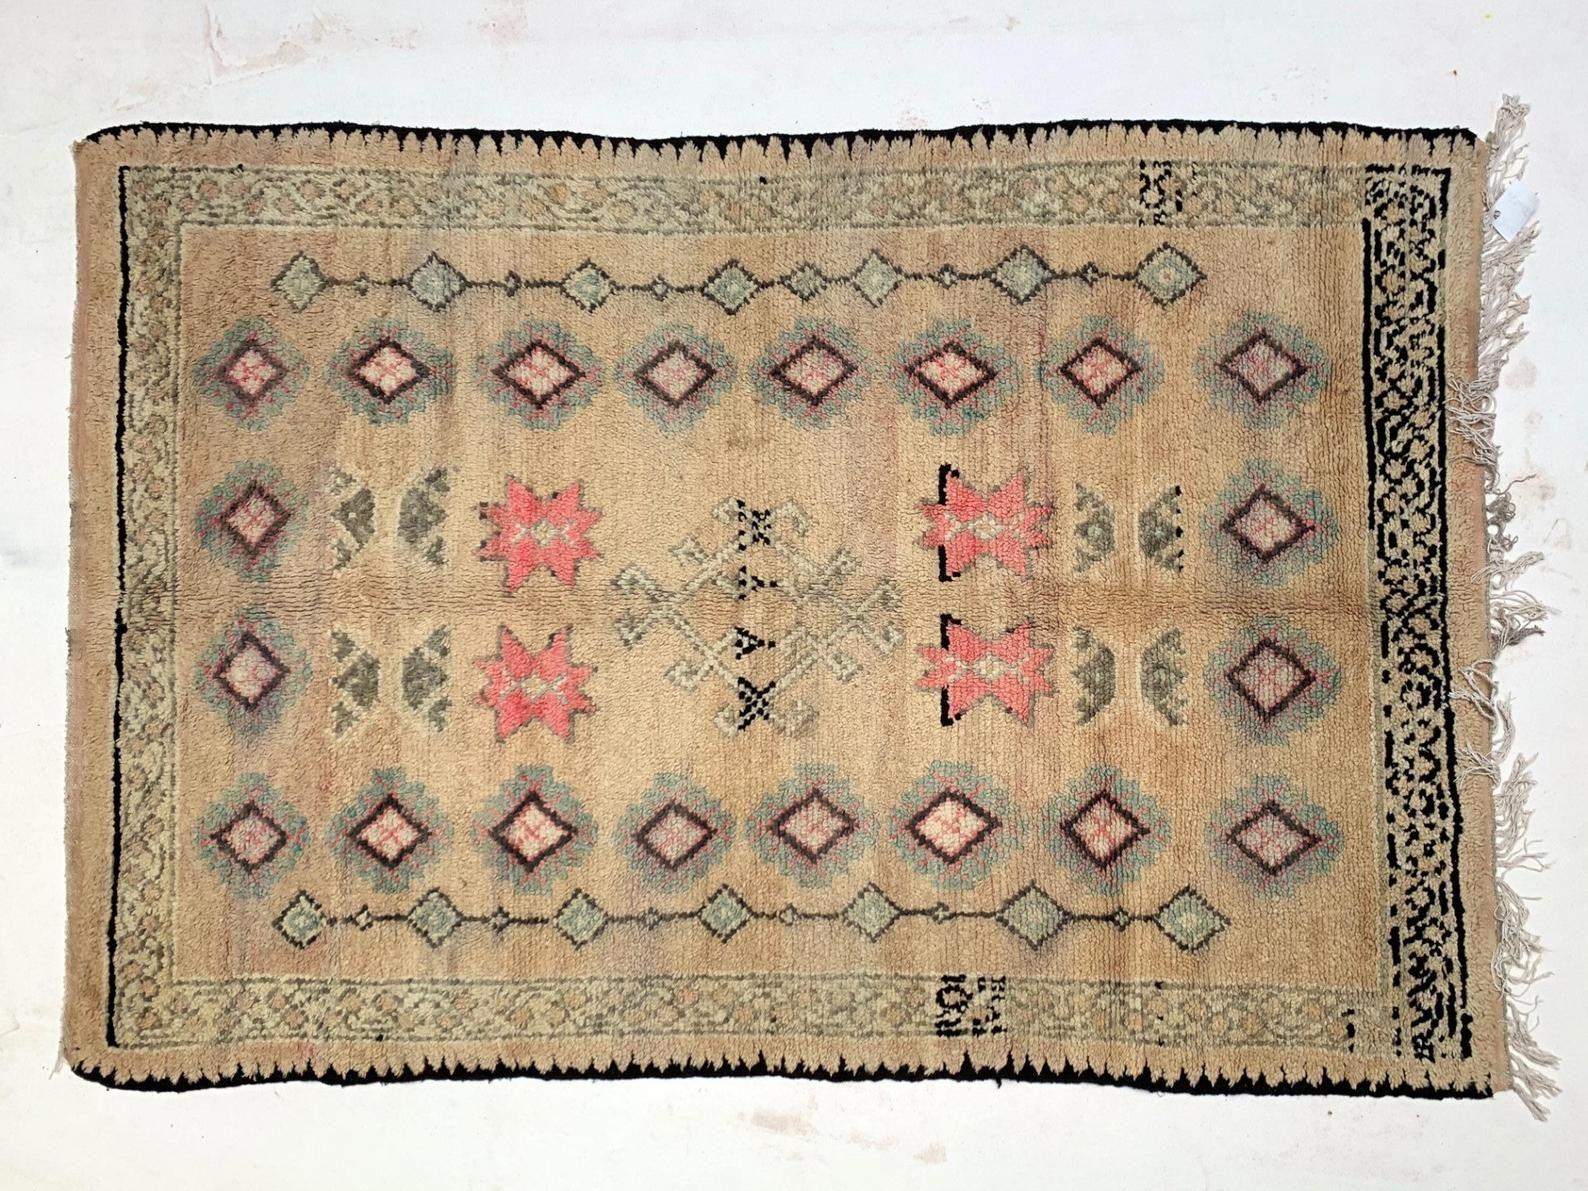 Vintage Bohemian Rug 5x8 Handmade Antique Unique Moroccan Etsy Bohemian Rug Vintage Oriental Rugs Rugs